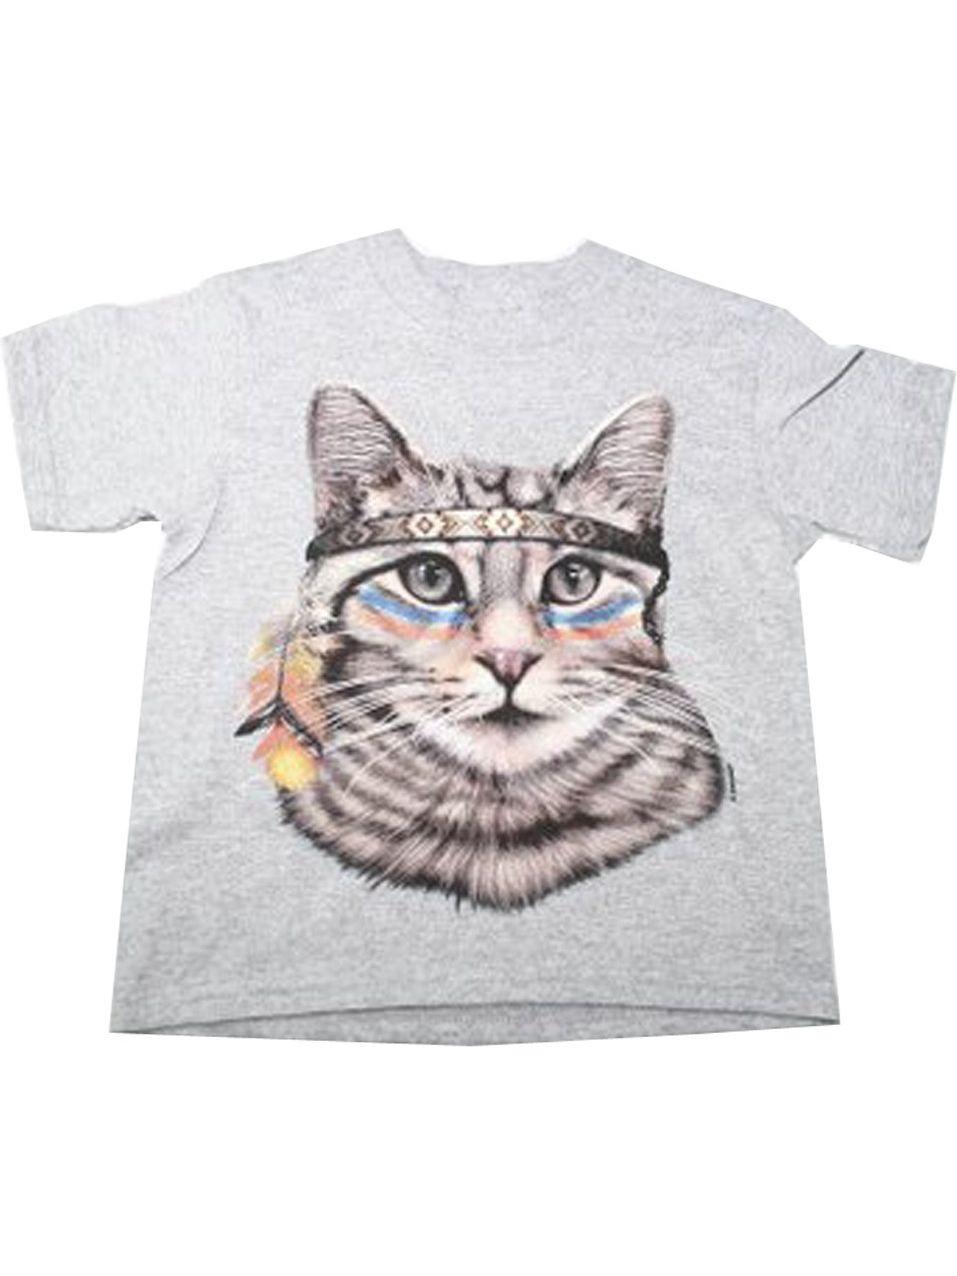 Girls Gray Native American Cat Print Short Sleeve T-Shirt